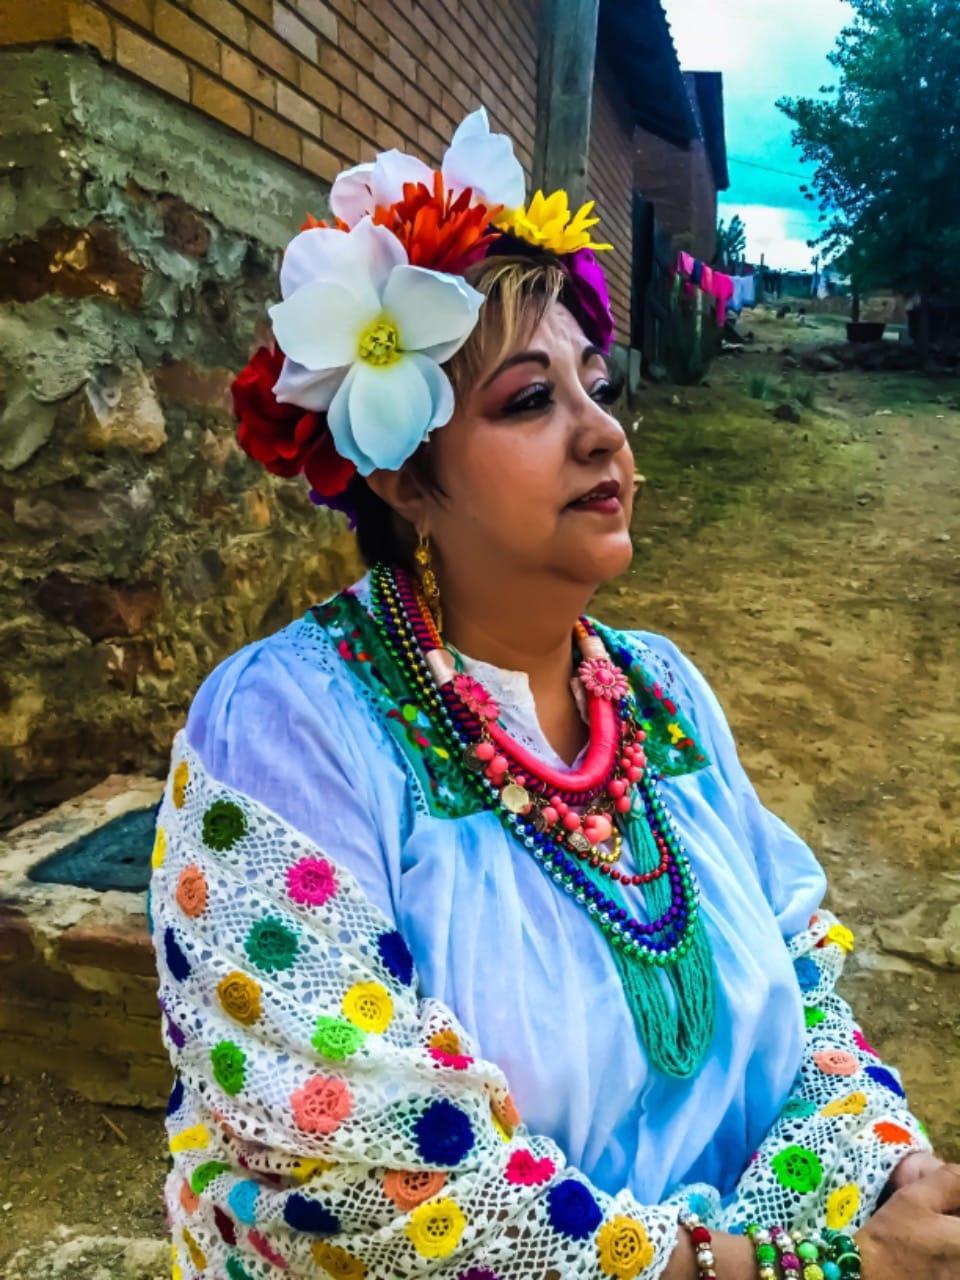 Maestra Silvia Martínez